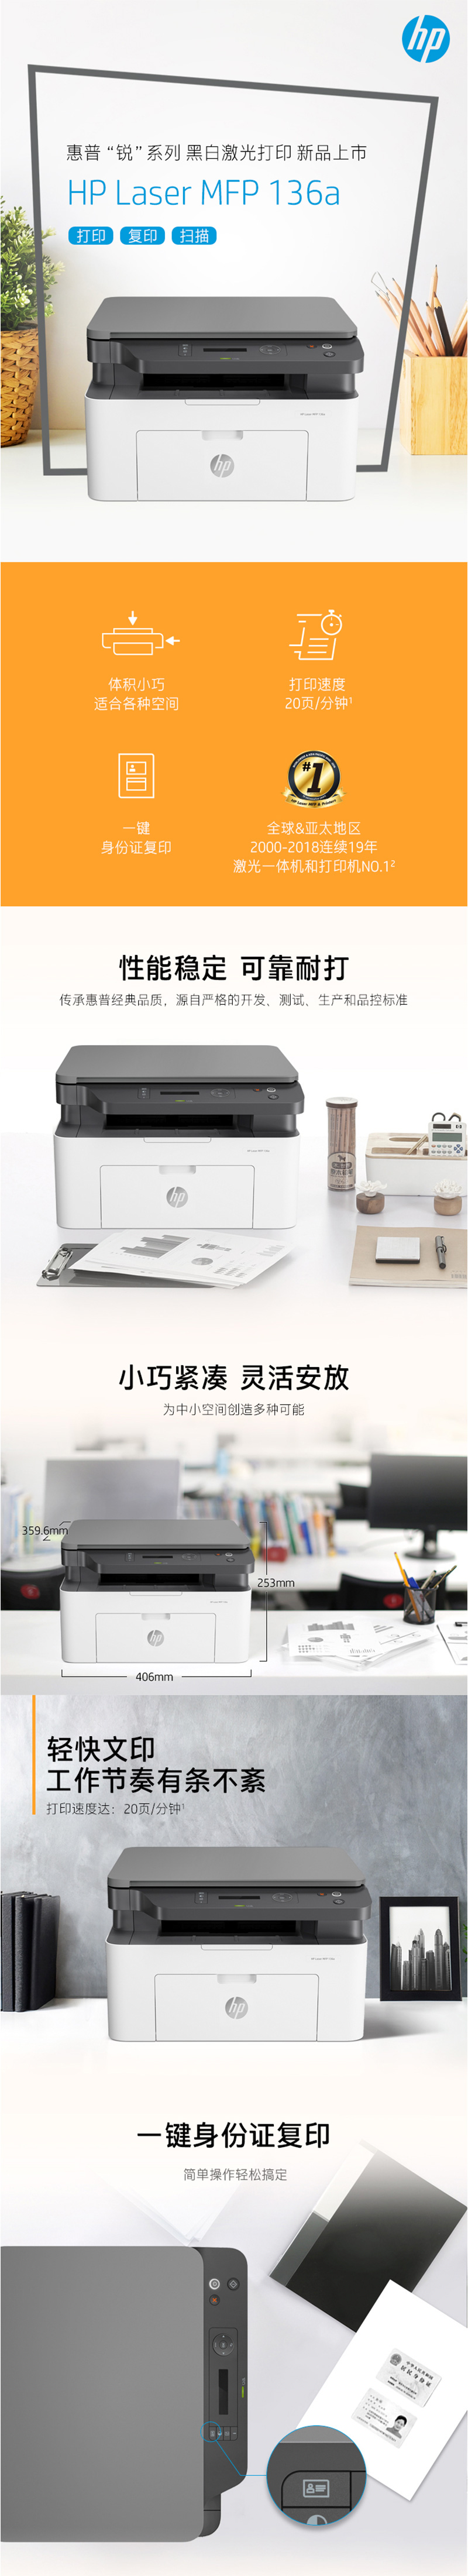 HP 136a 激光打印机